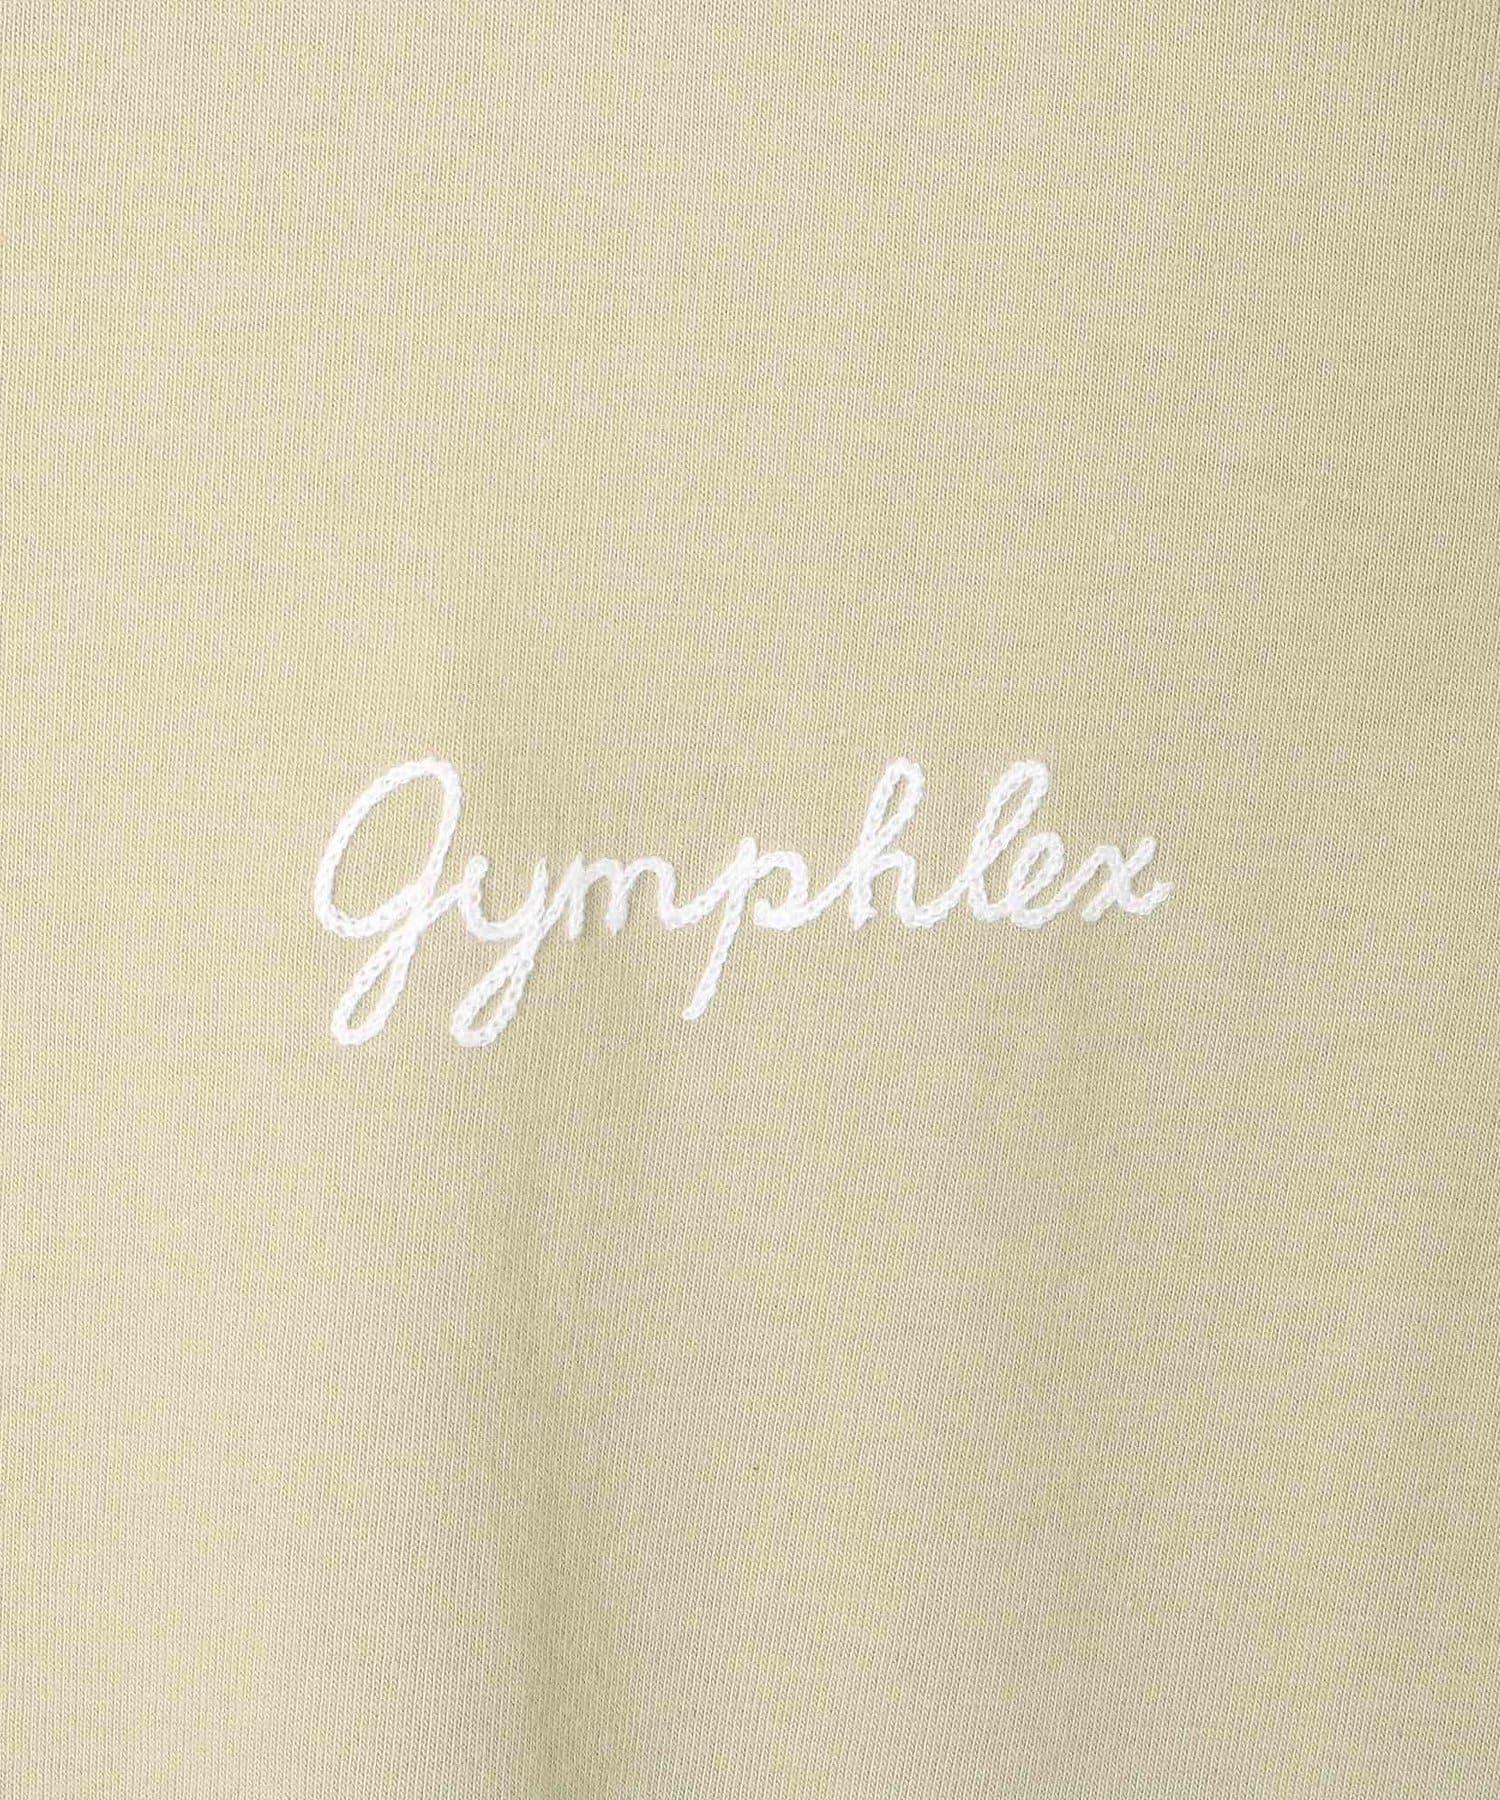 CIAOPANIC TYPY(チャオパニックティピー) 【GYMPHLEX/ジムフレックス】ワンポイントTee